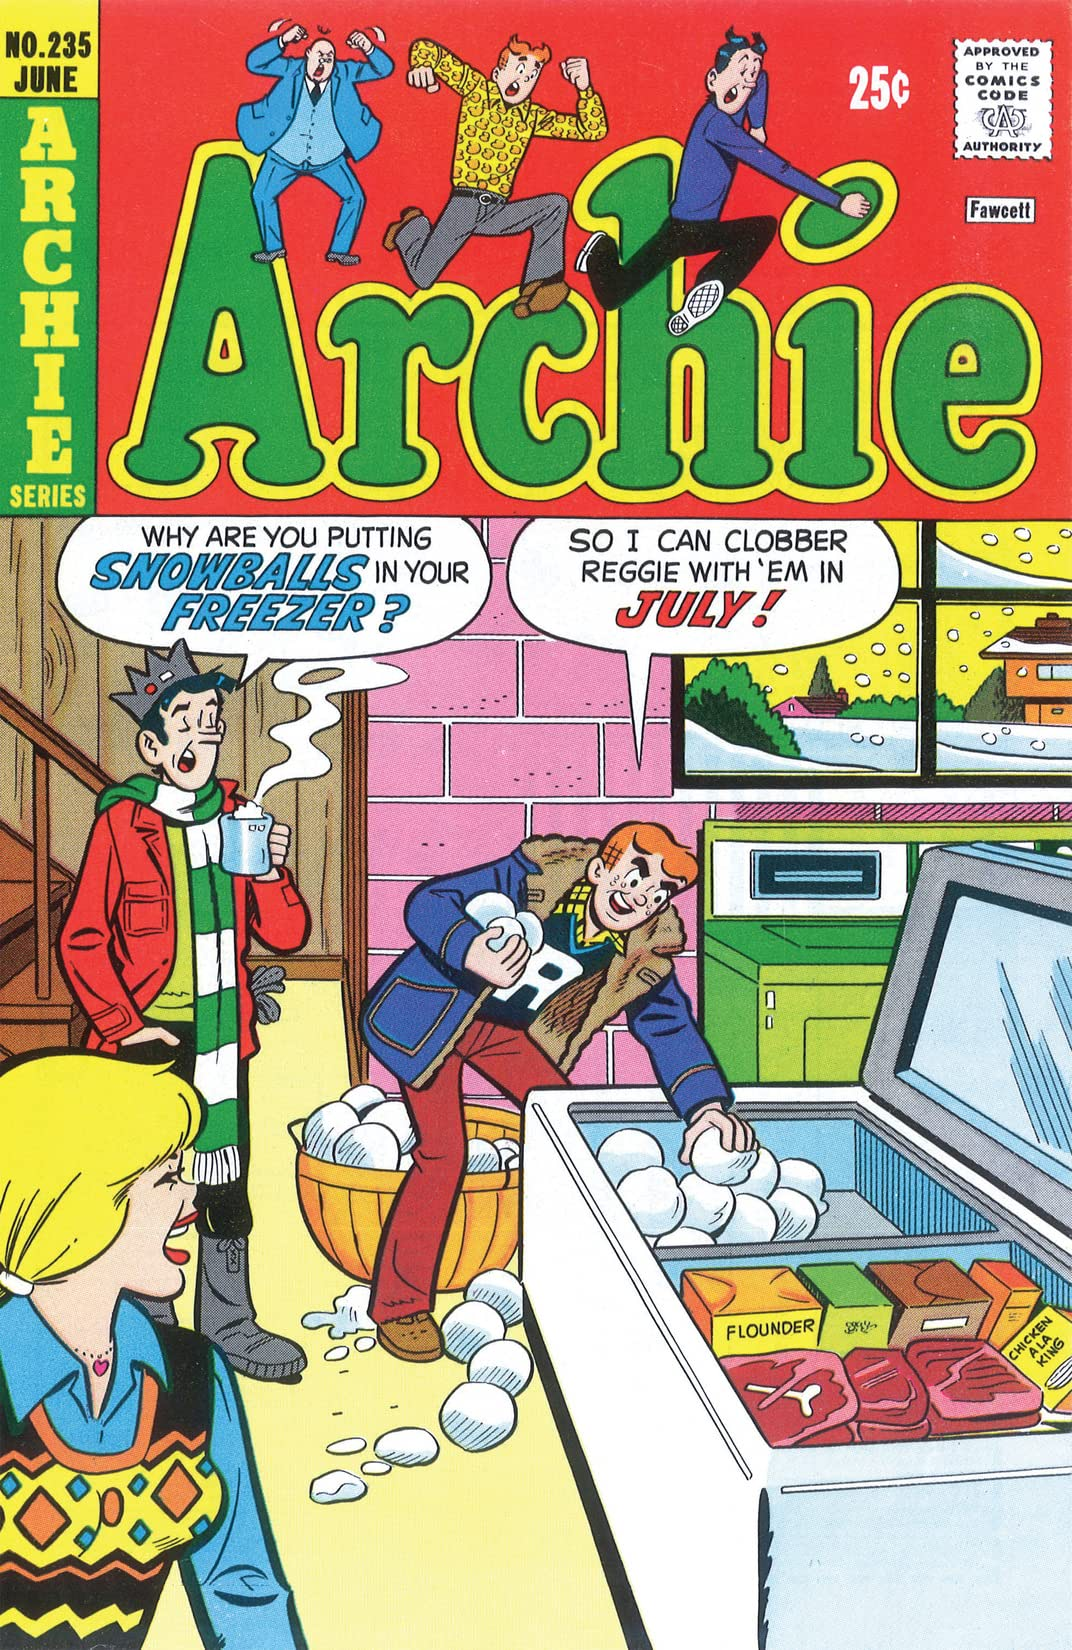 Archie #235